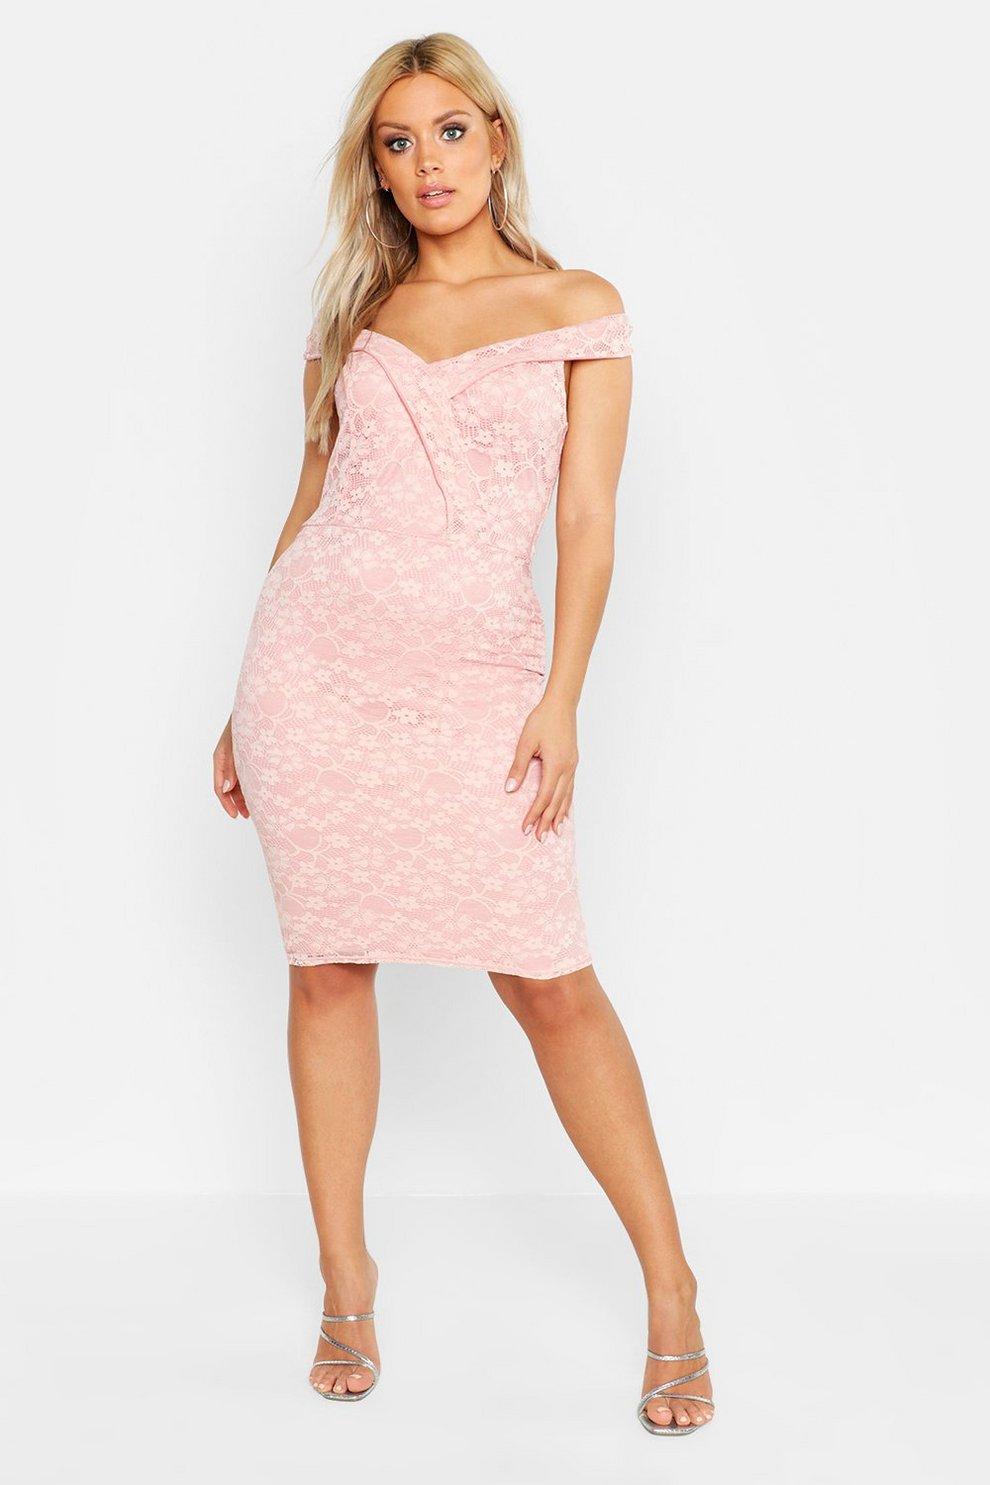 Sweetheart Mini Dress